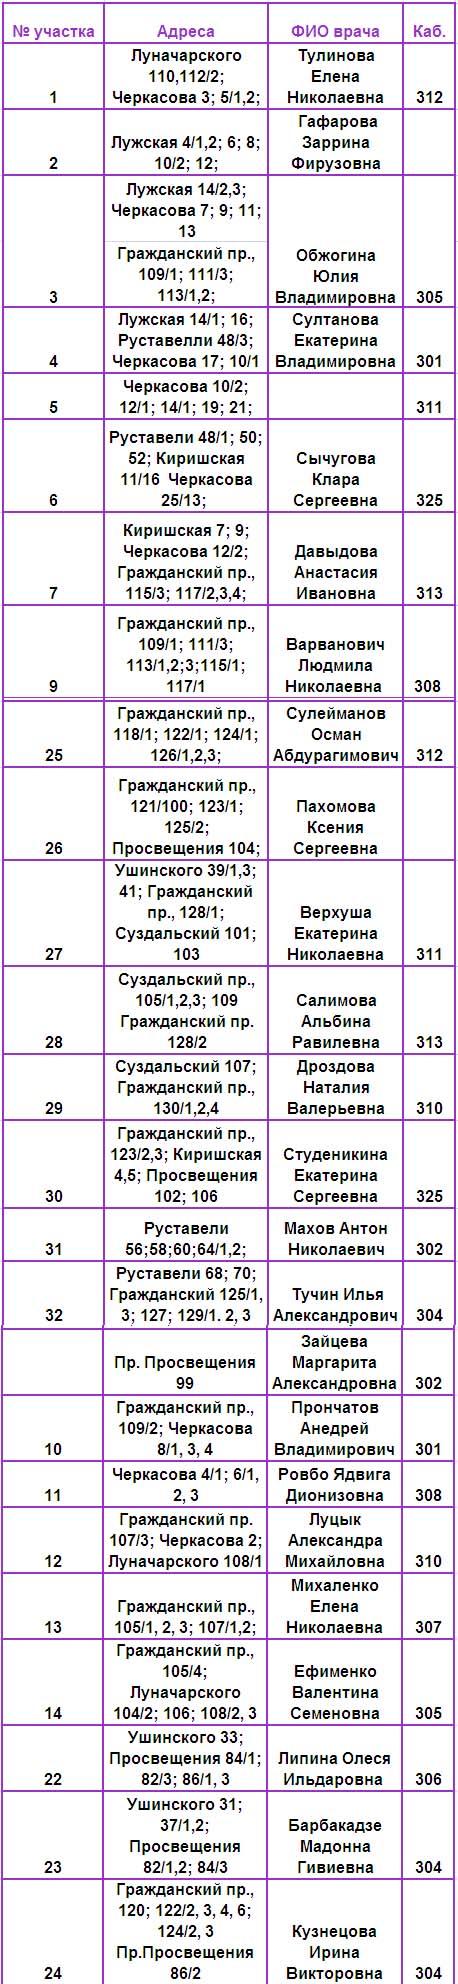 врачи терапевты Гп 86 СПБ